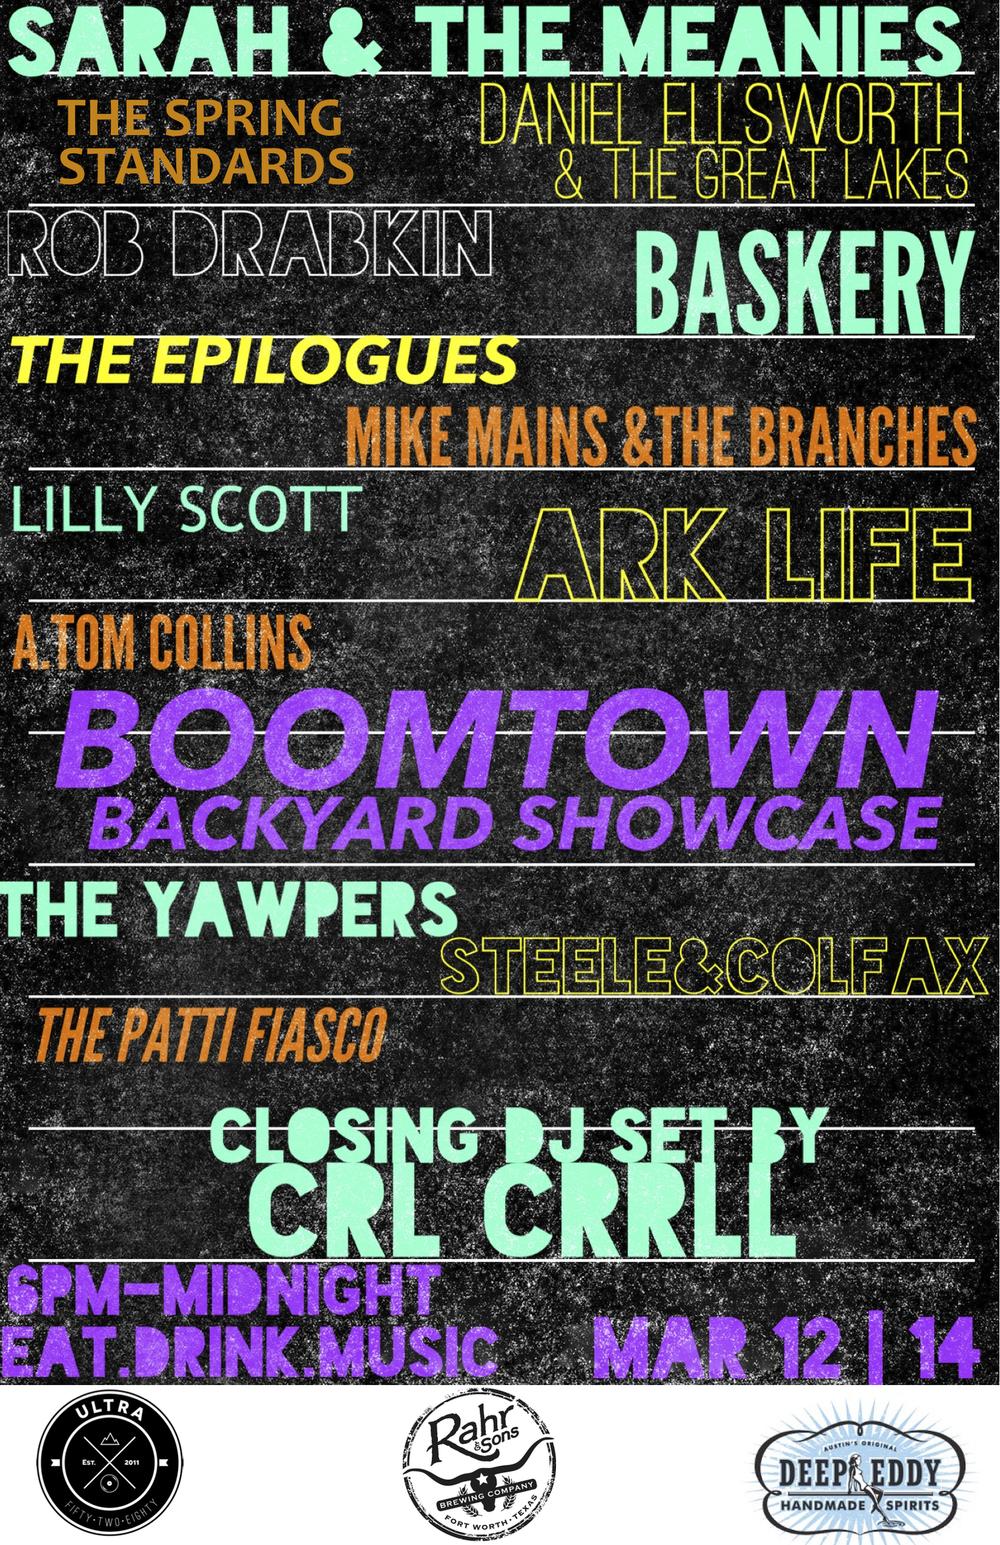 BoomtownShowcase_Poster_SXSW2014_JPEG.jpg